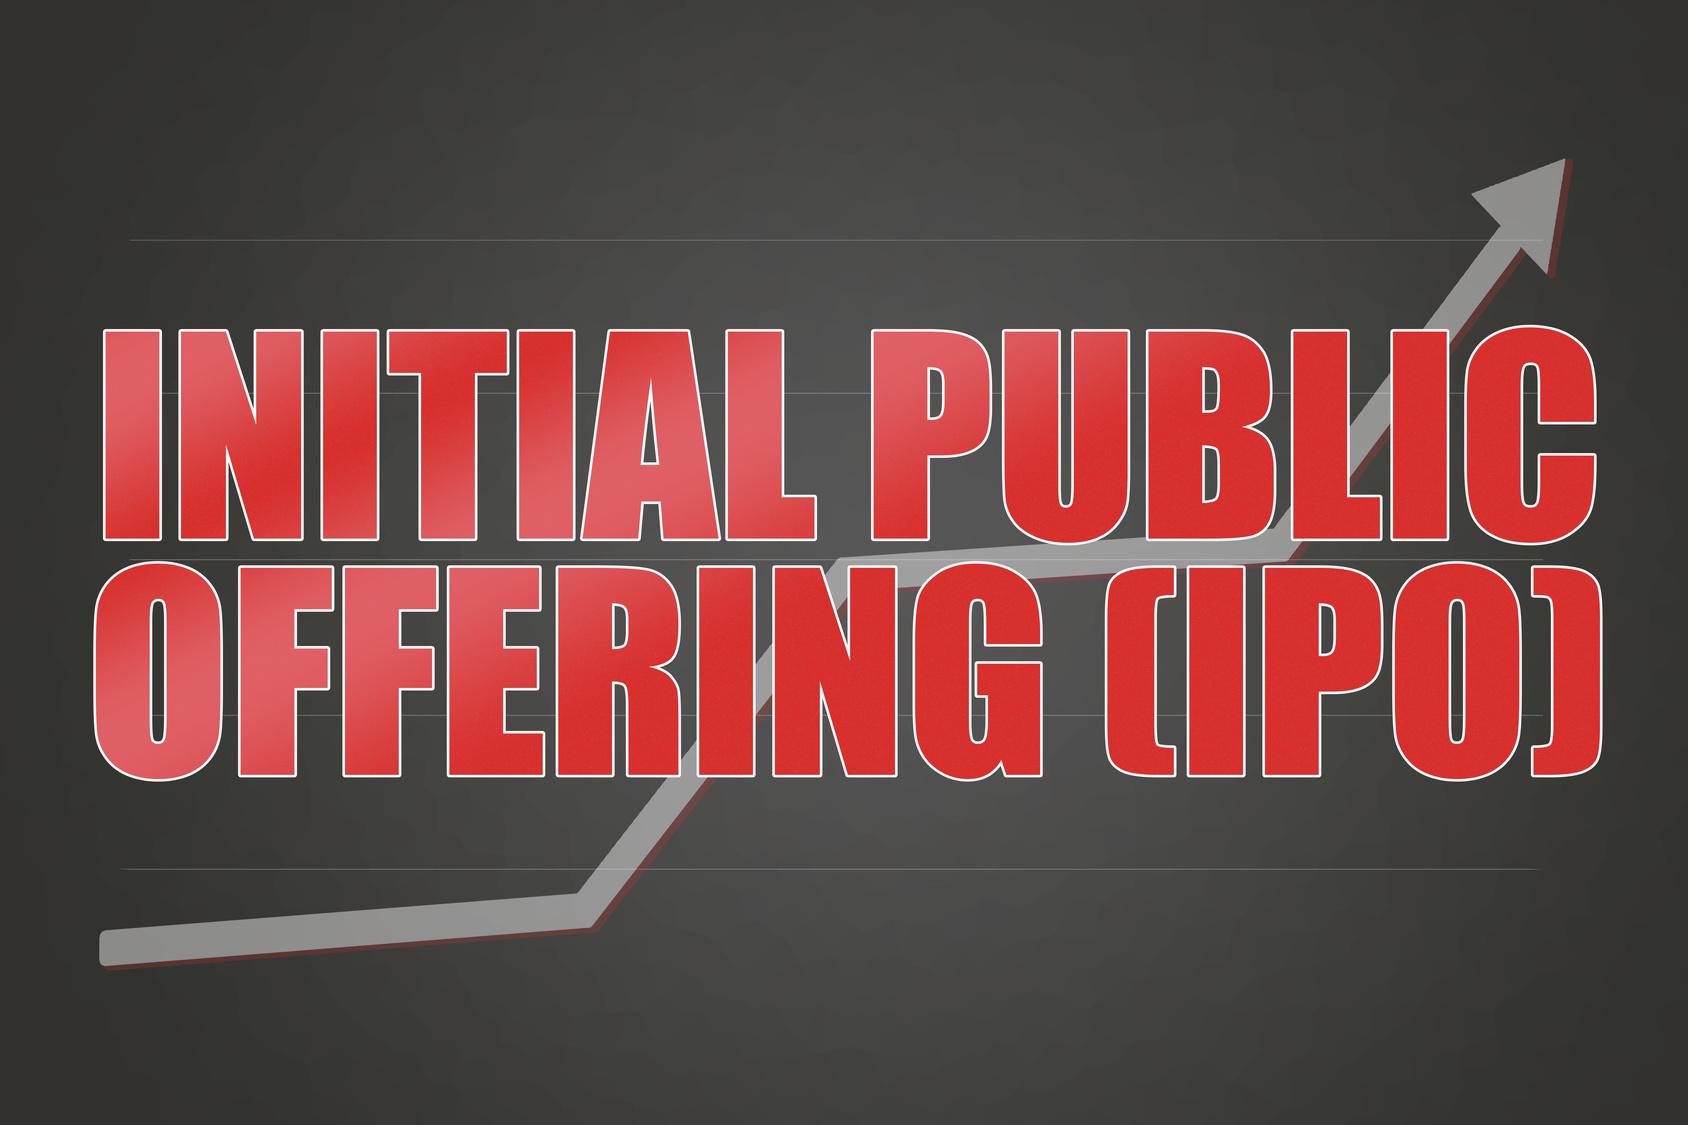 【IPO株投資とは】一攫千金のチャンス!?「新規公開株」の概要と買い方について基本から解説。!